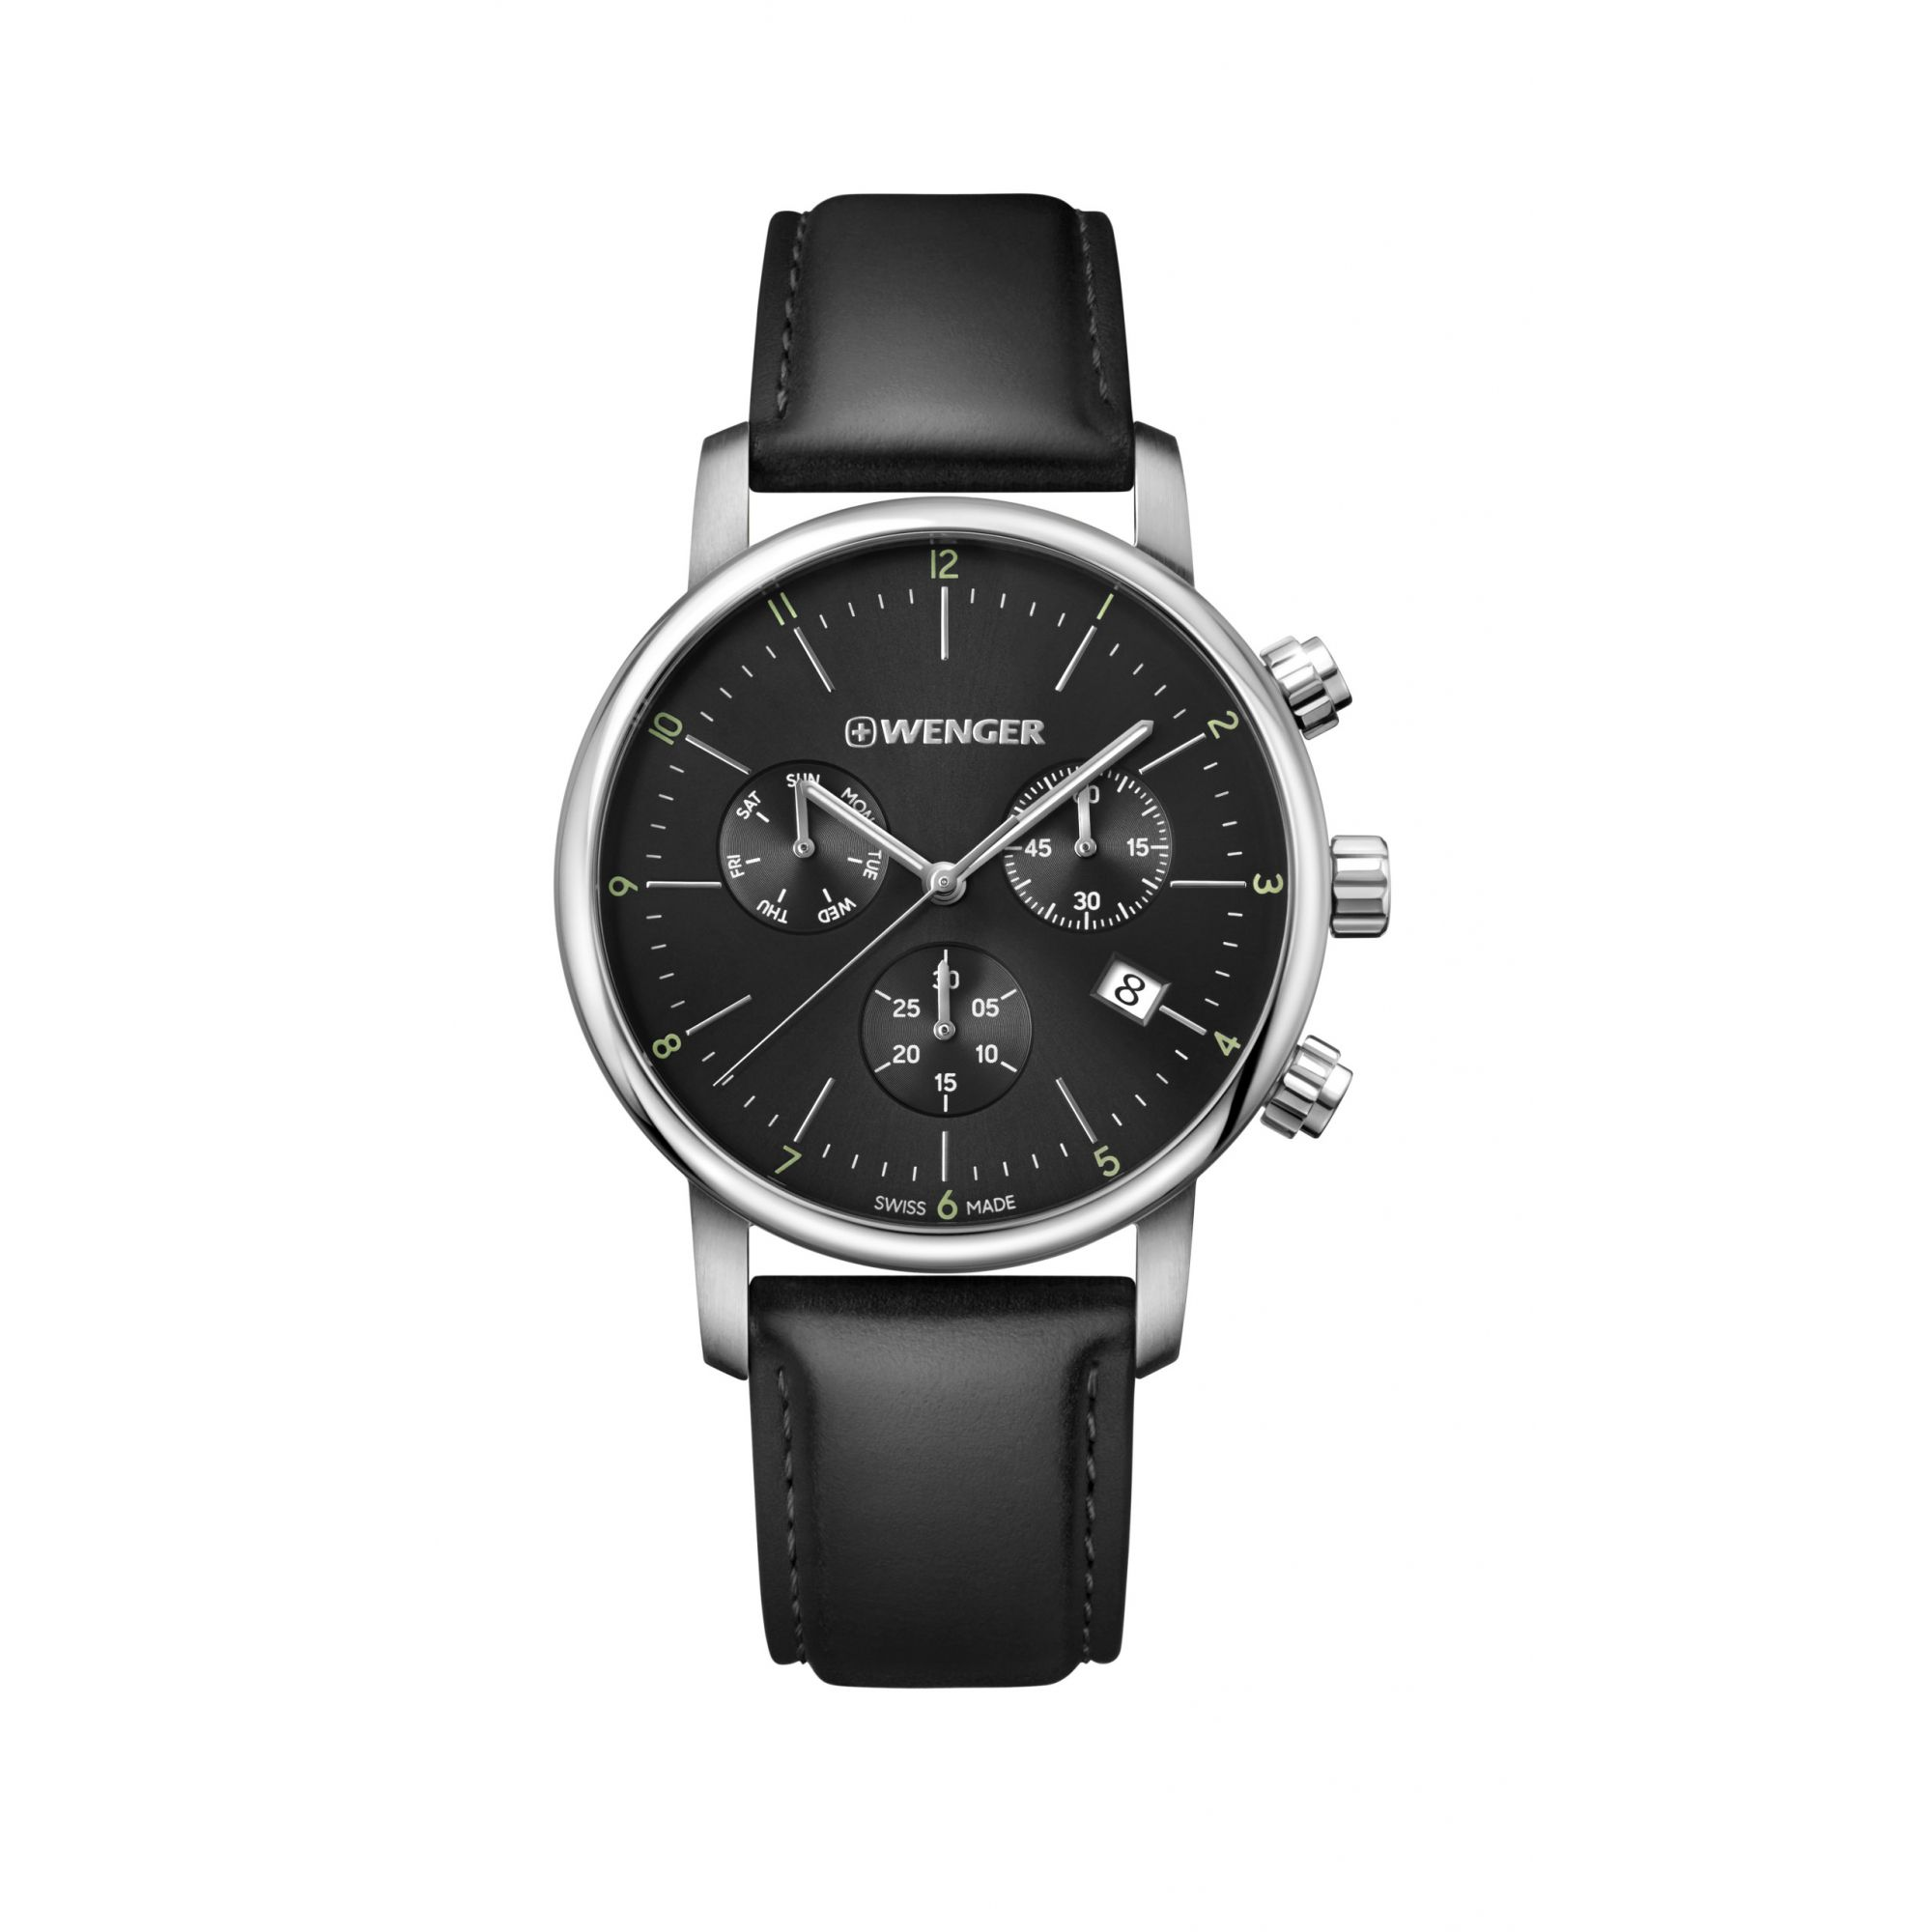 Relógio Wenger Urban Classic Chrono Preto - WENURBC102